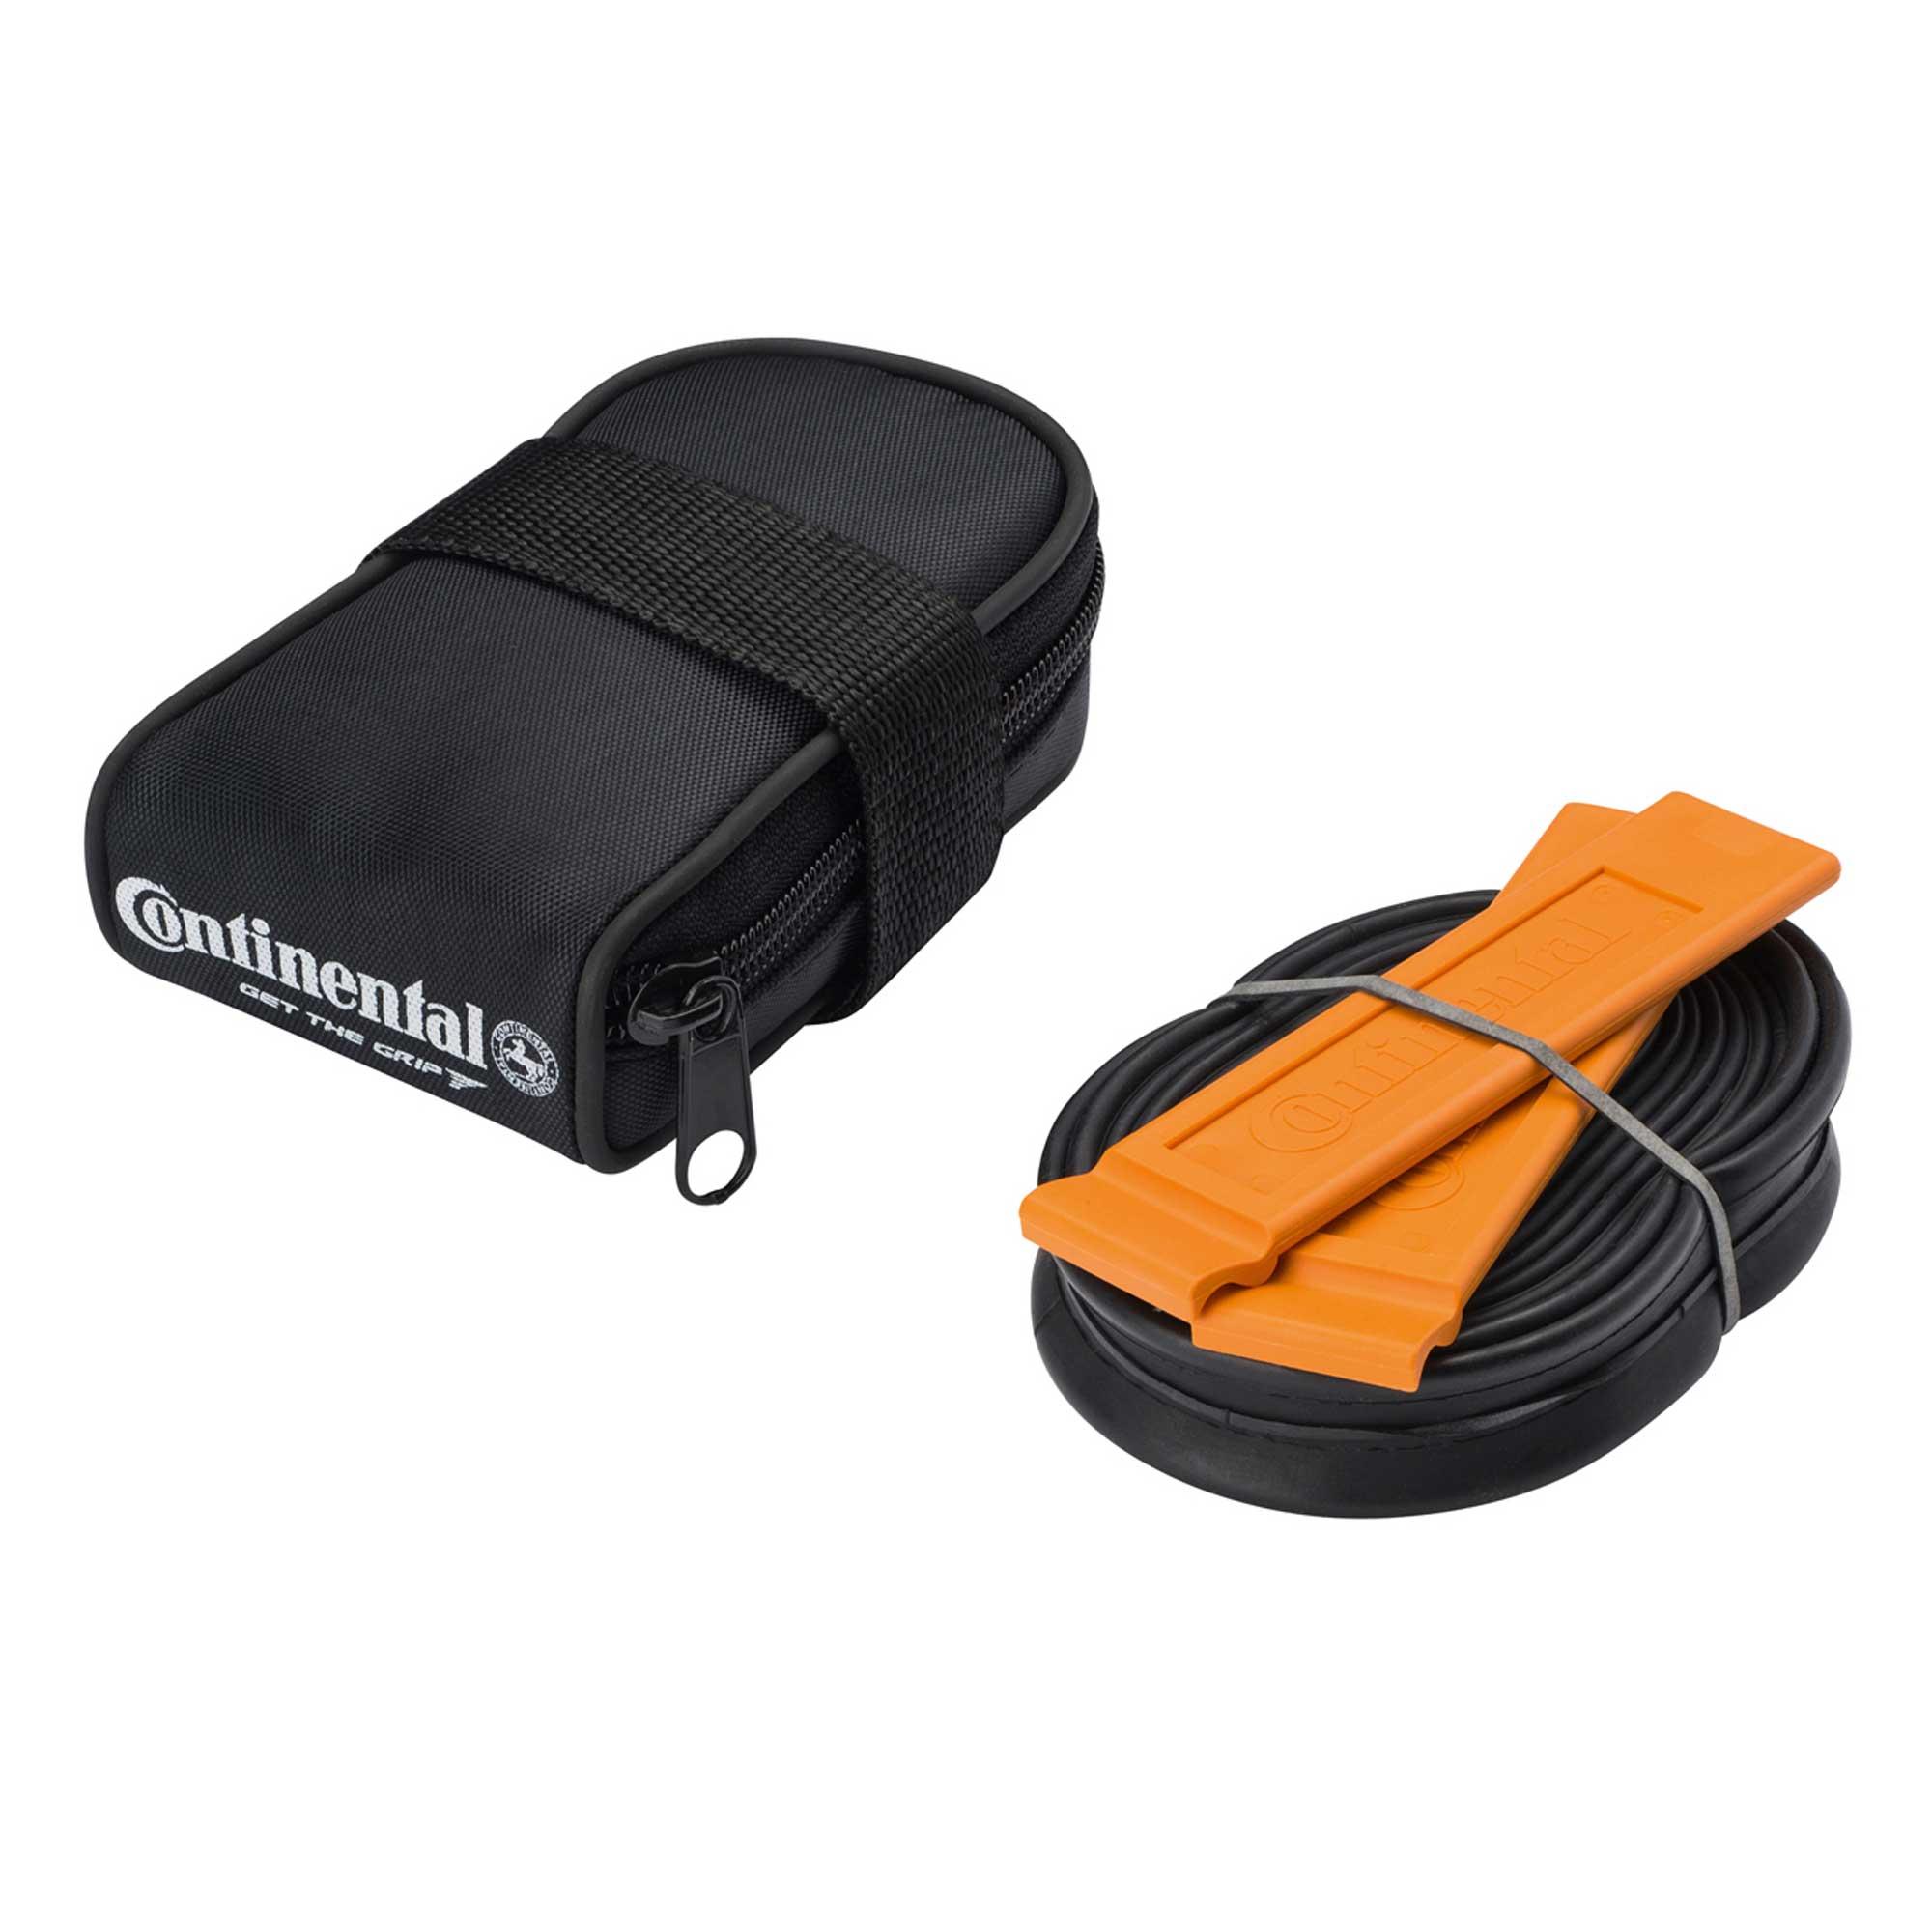 Windbreak Storage Carry Bag Cover for 105 cm Windbreaks Size:112x20cm